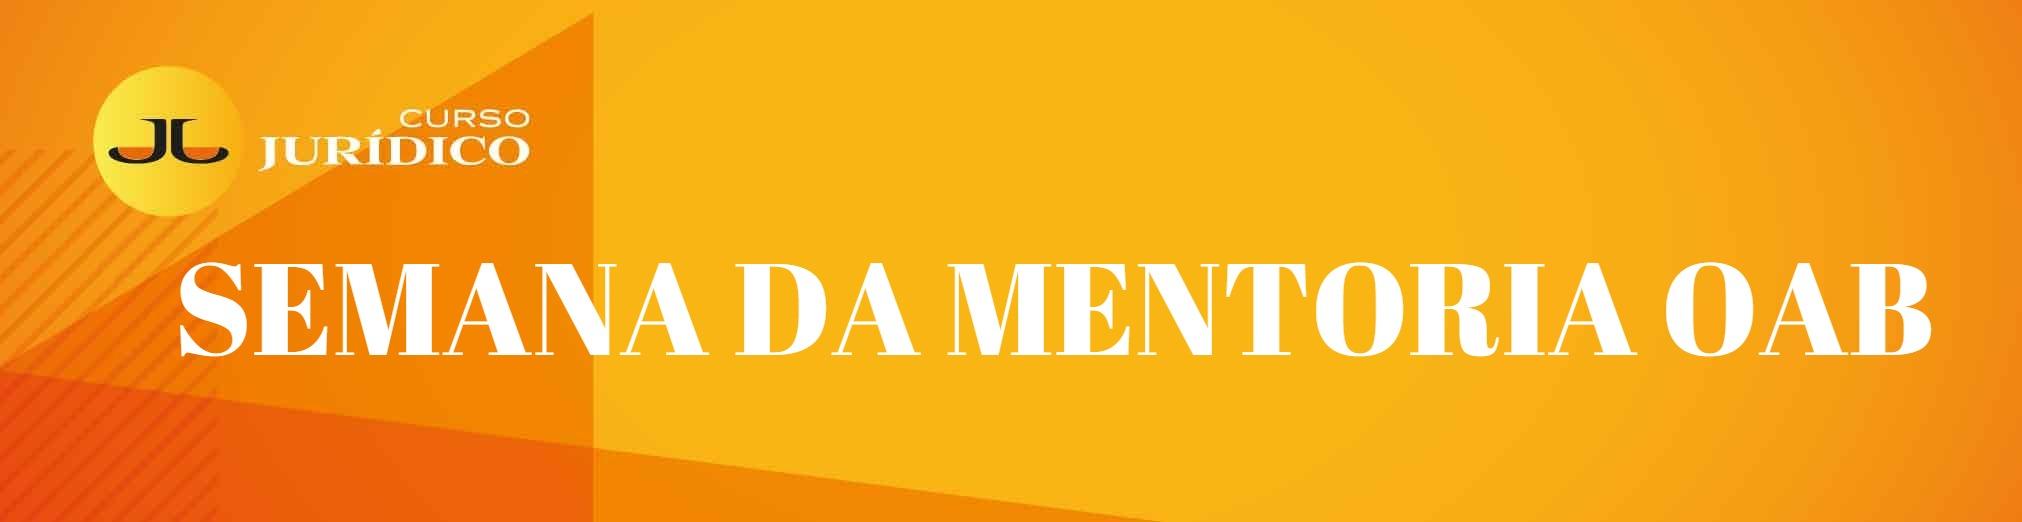 SEMANA DA MENTORIA OAB